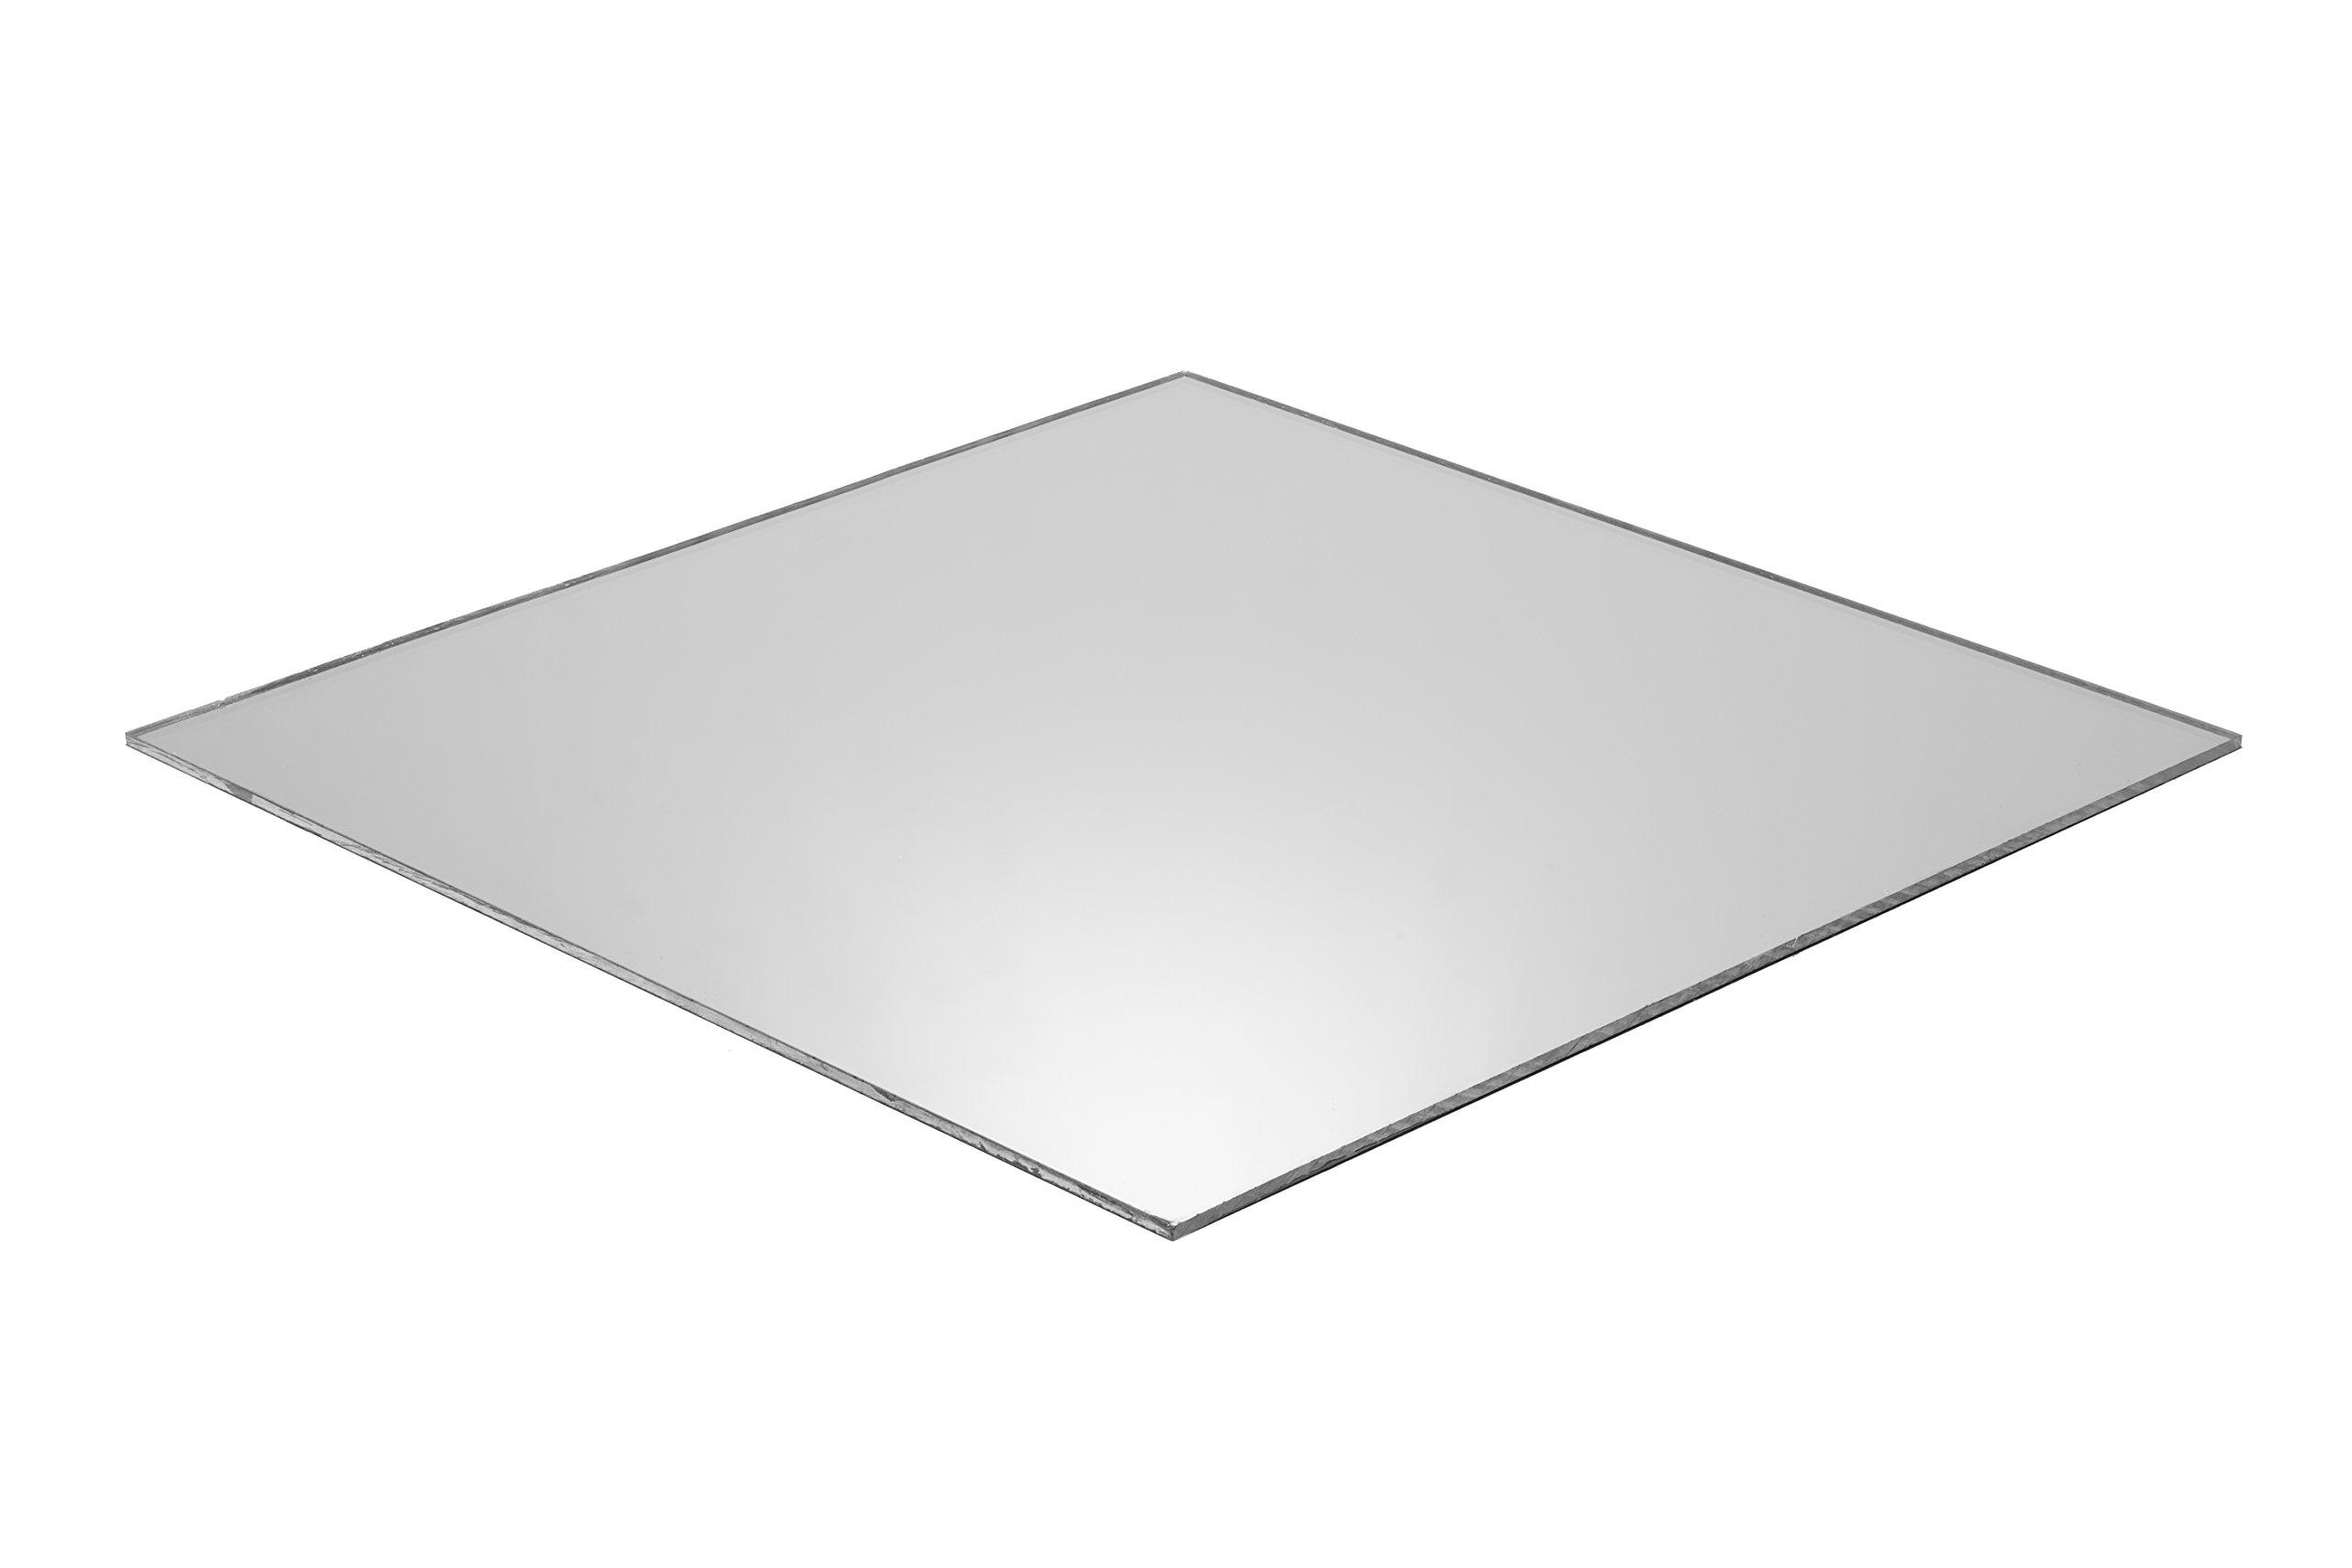 Falken Design Corporation MIR1-8/2436 Plastic Acrylic Plexiglas Lucite Acrylic Silver Mirror Sheet, 24'' x 36'', 1/8'' Thick